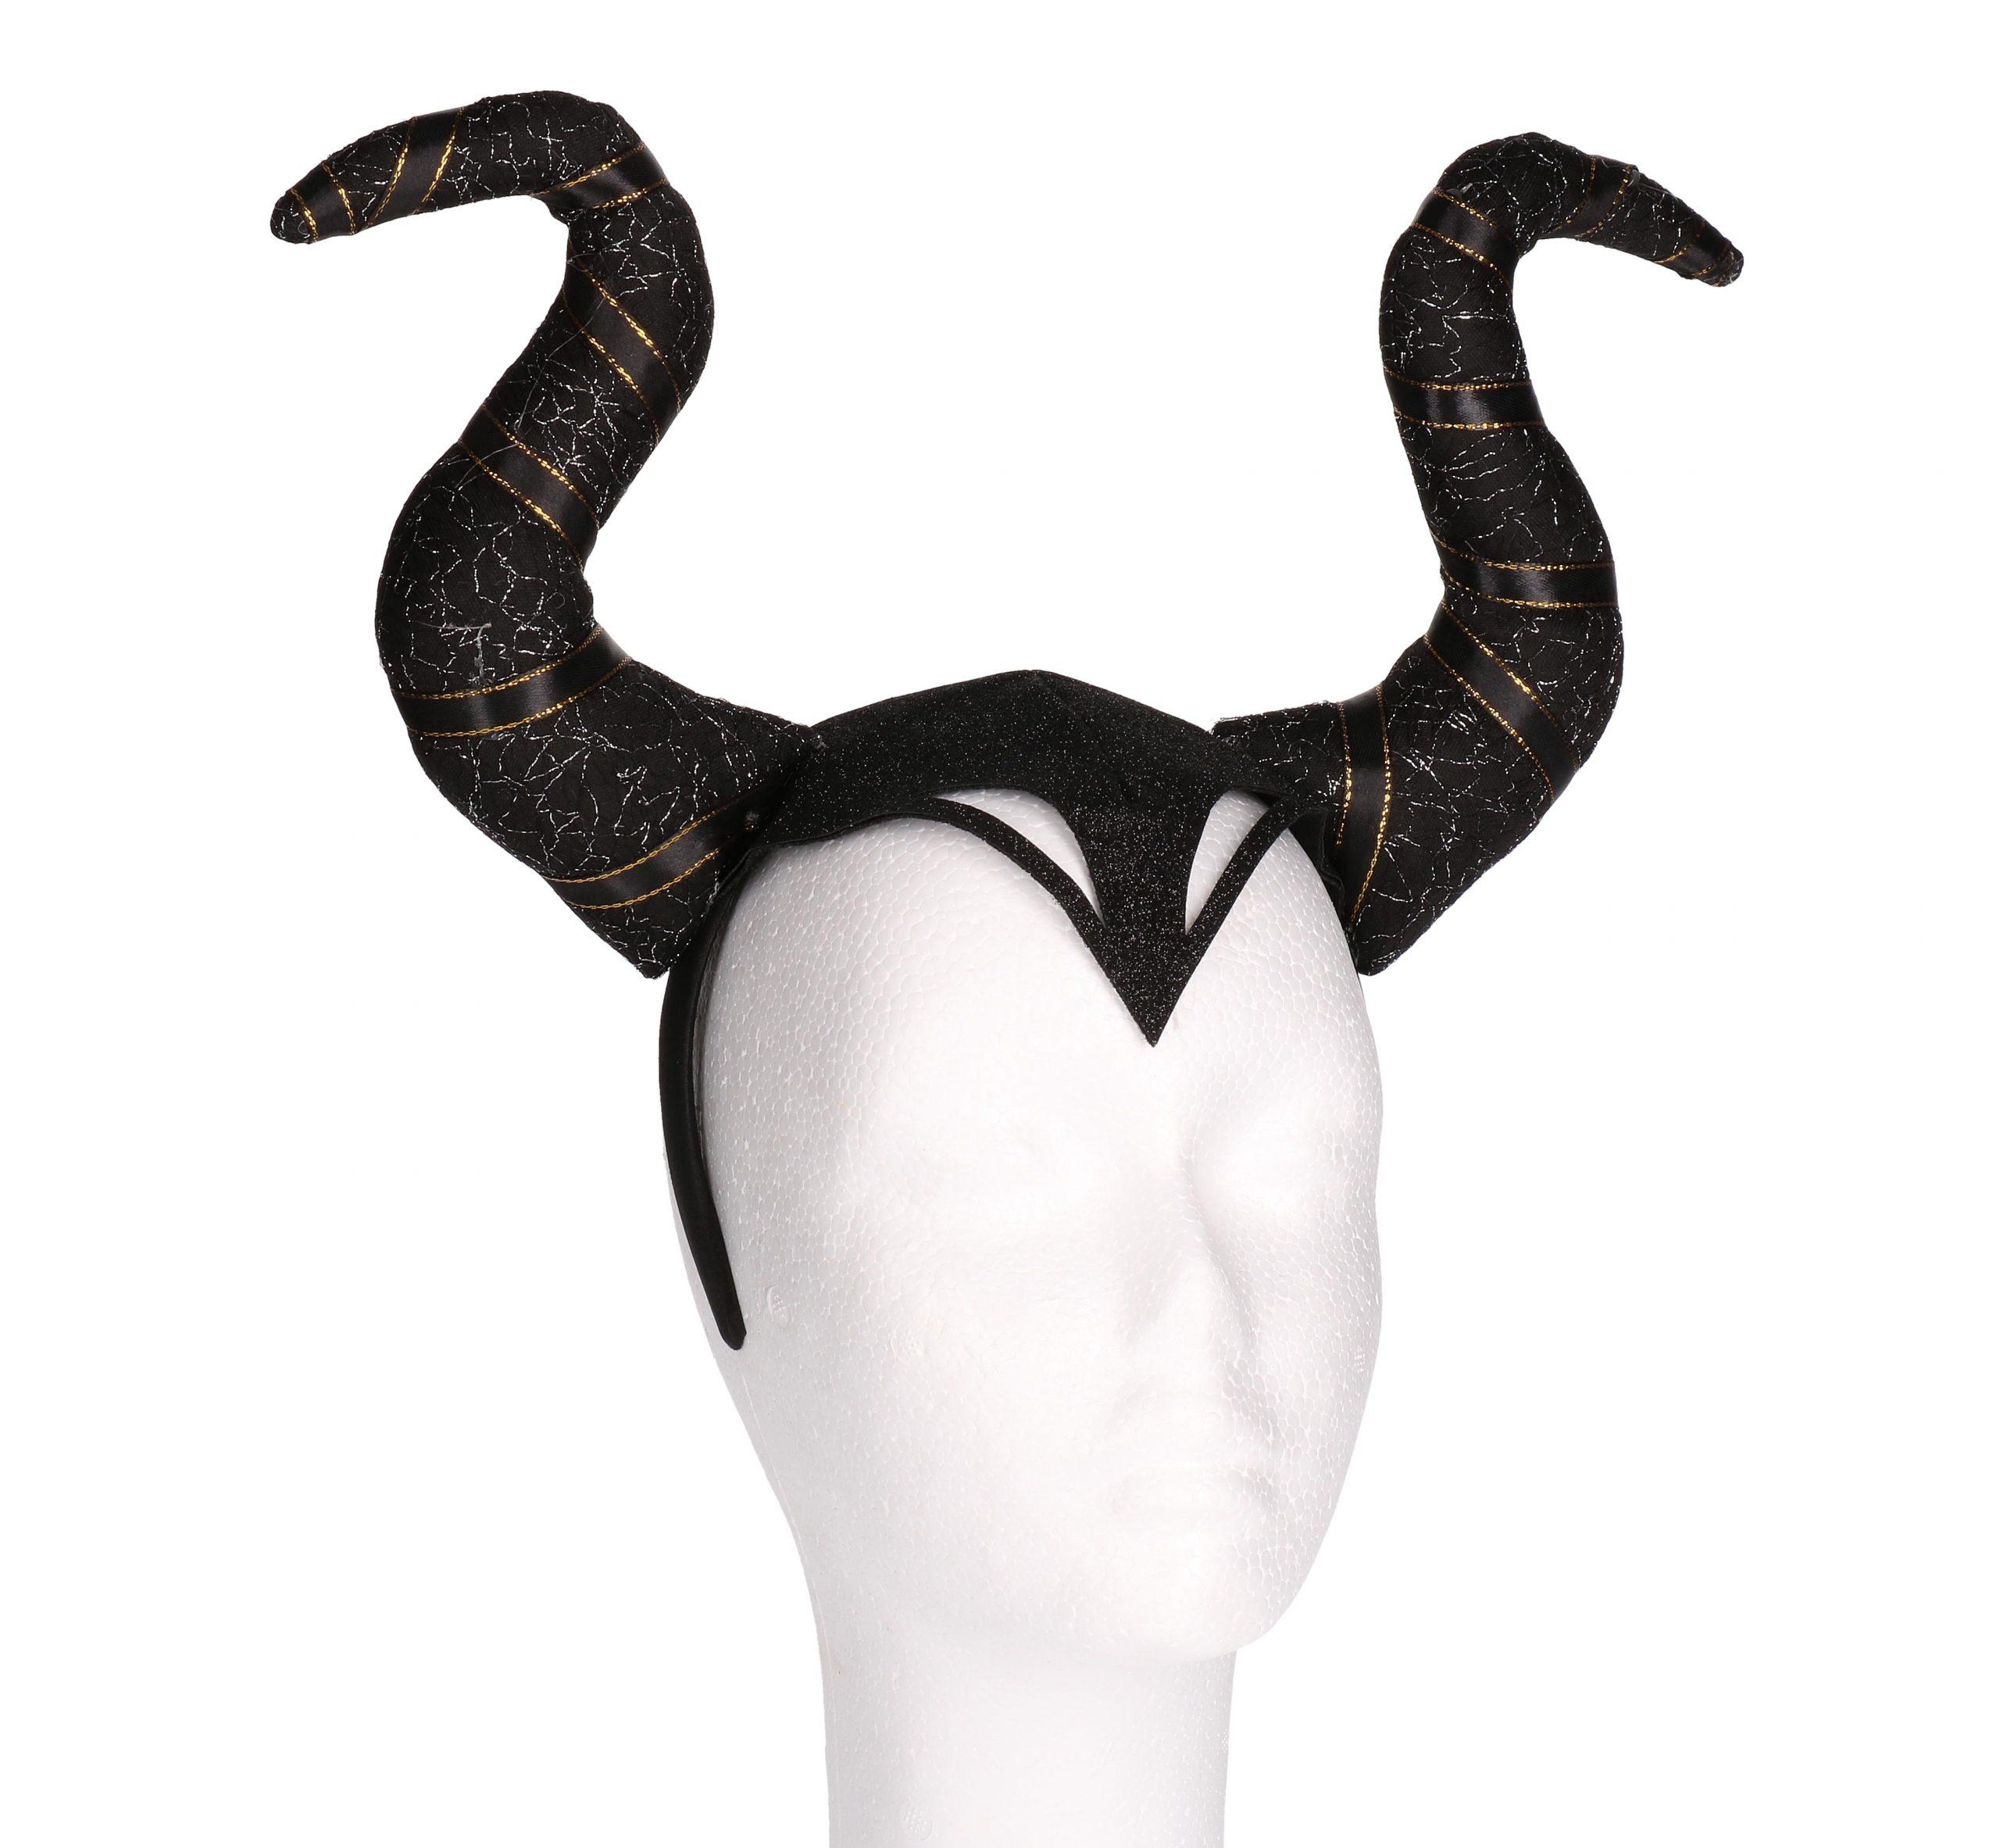 Diadeem hoorns zwart